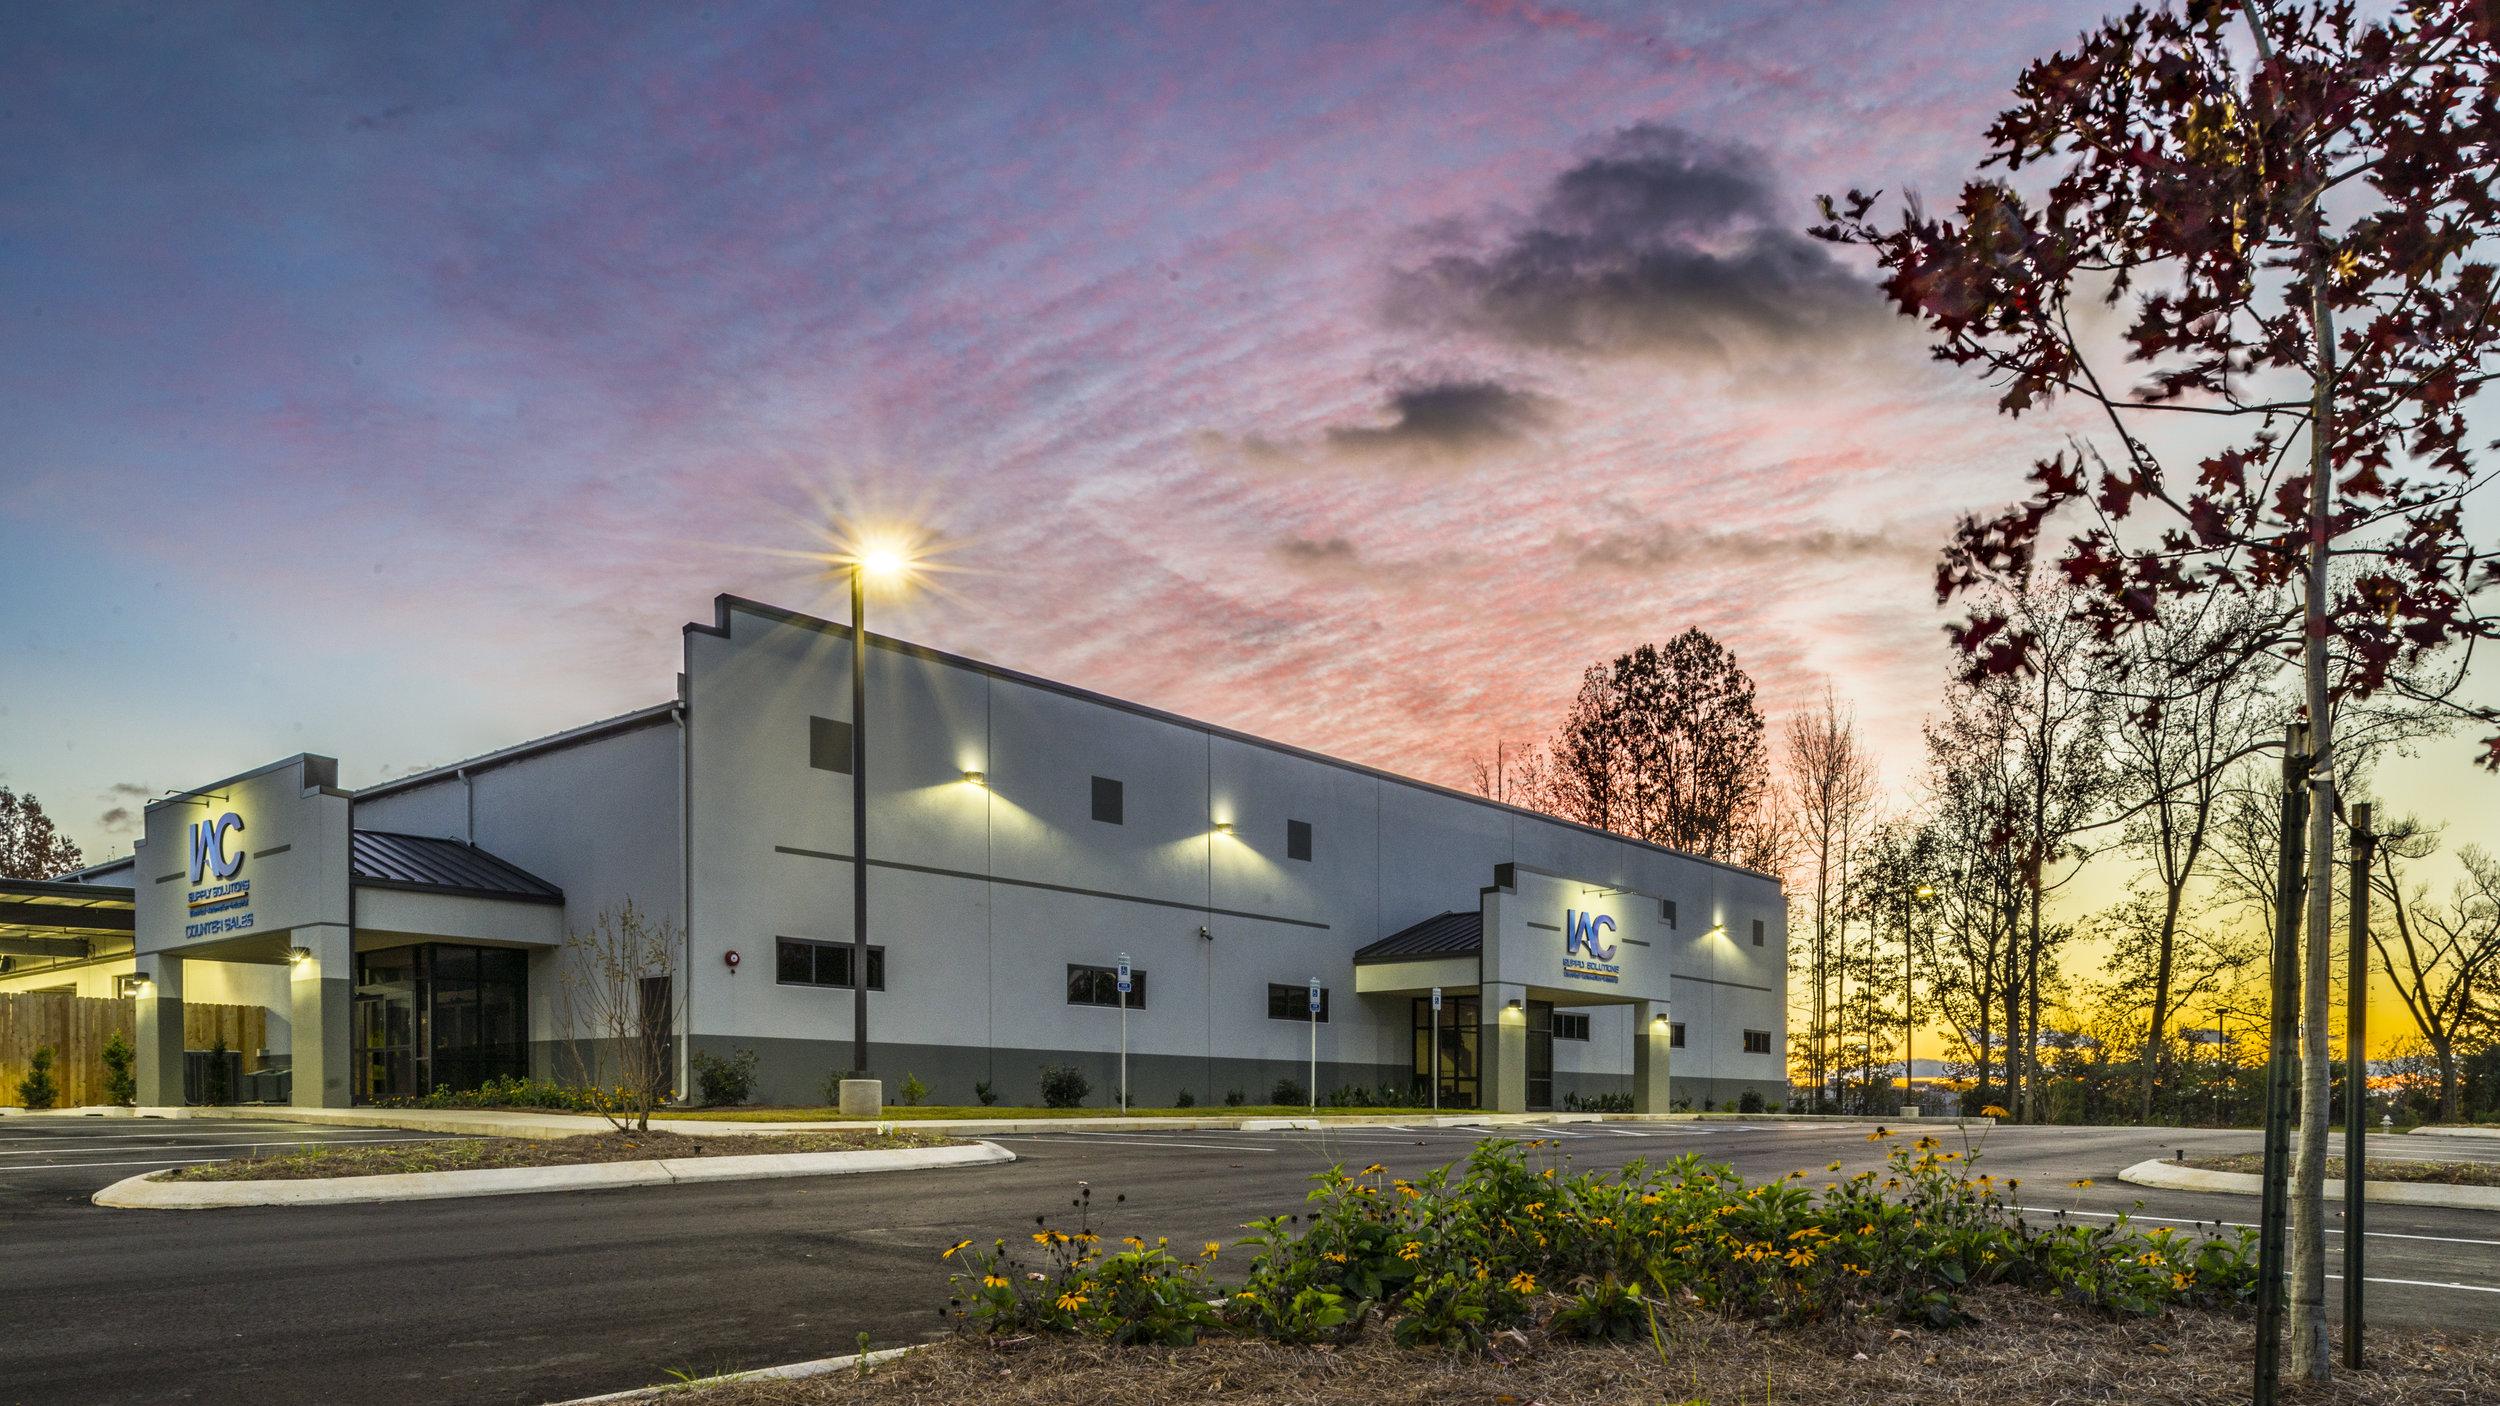 Industrial: IAC Bartlett  Architect: Ross Witt  Photography: Paradigm Marketing